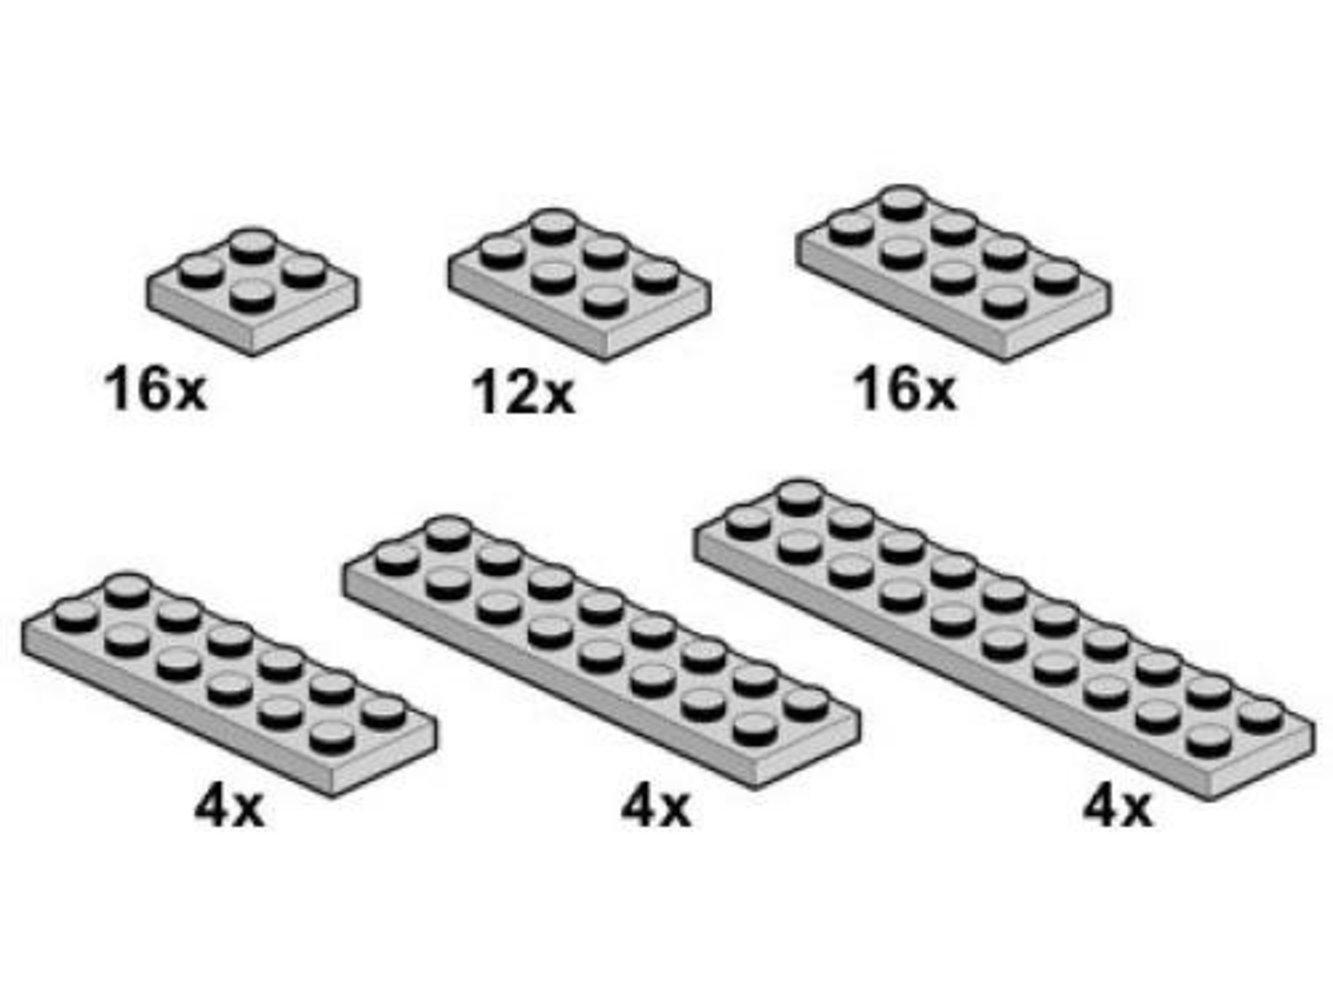 Light Gray Plates 2 x n